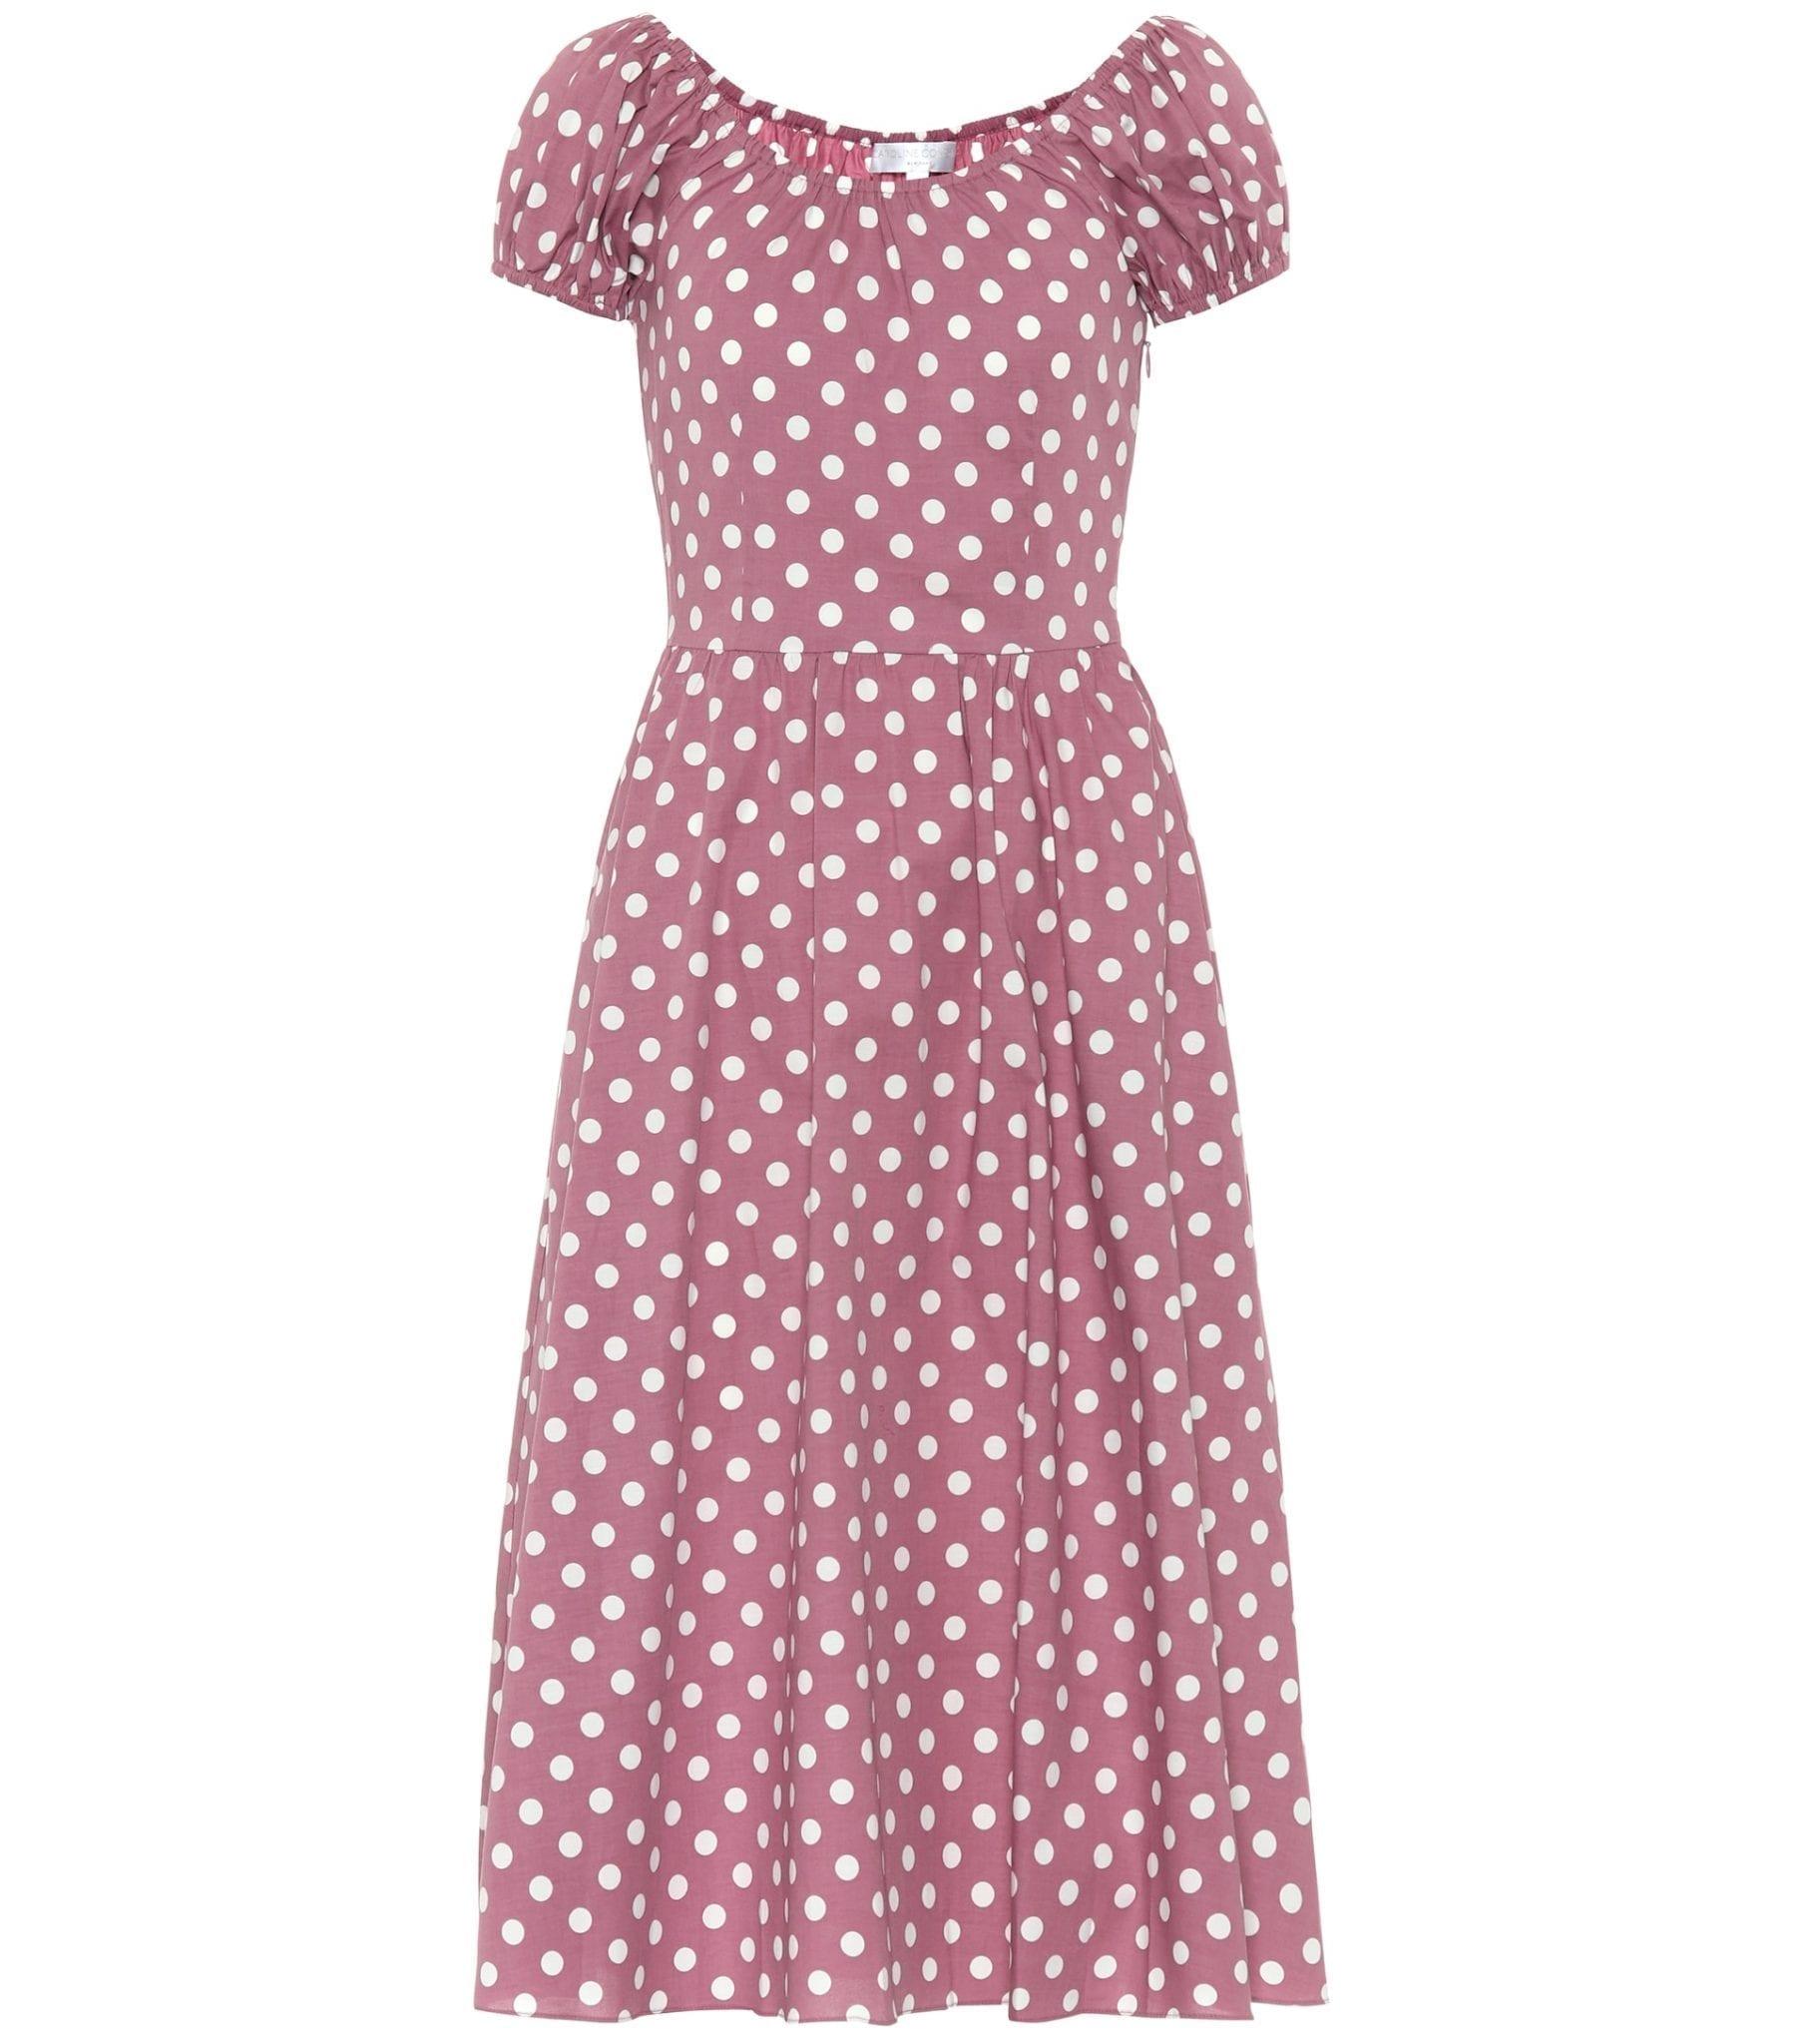 CAROLINE CONSTAS Mariette Polka-Dot Dress